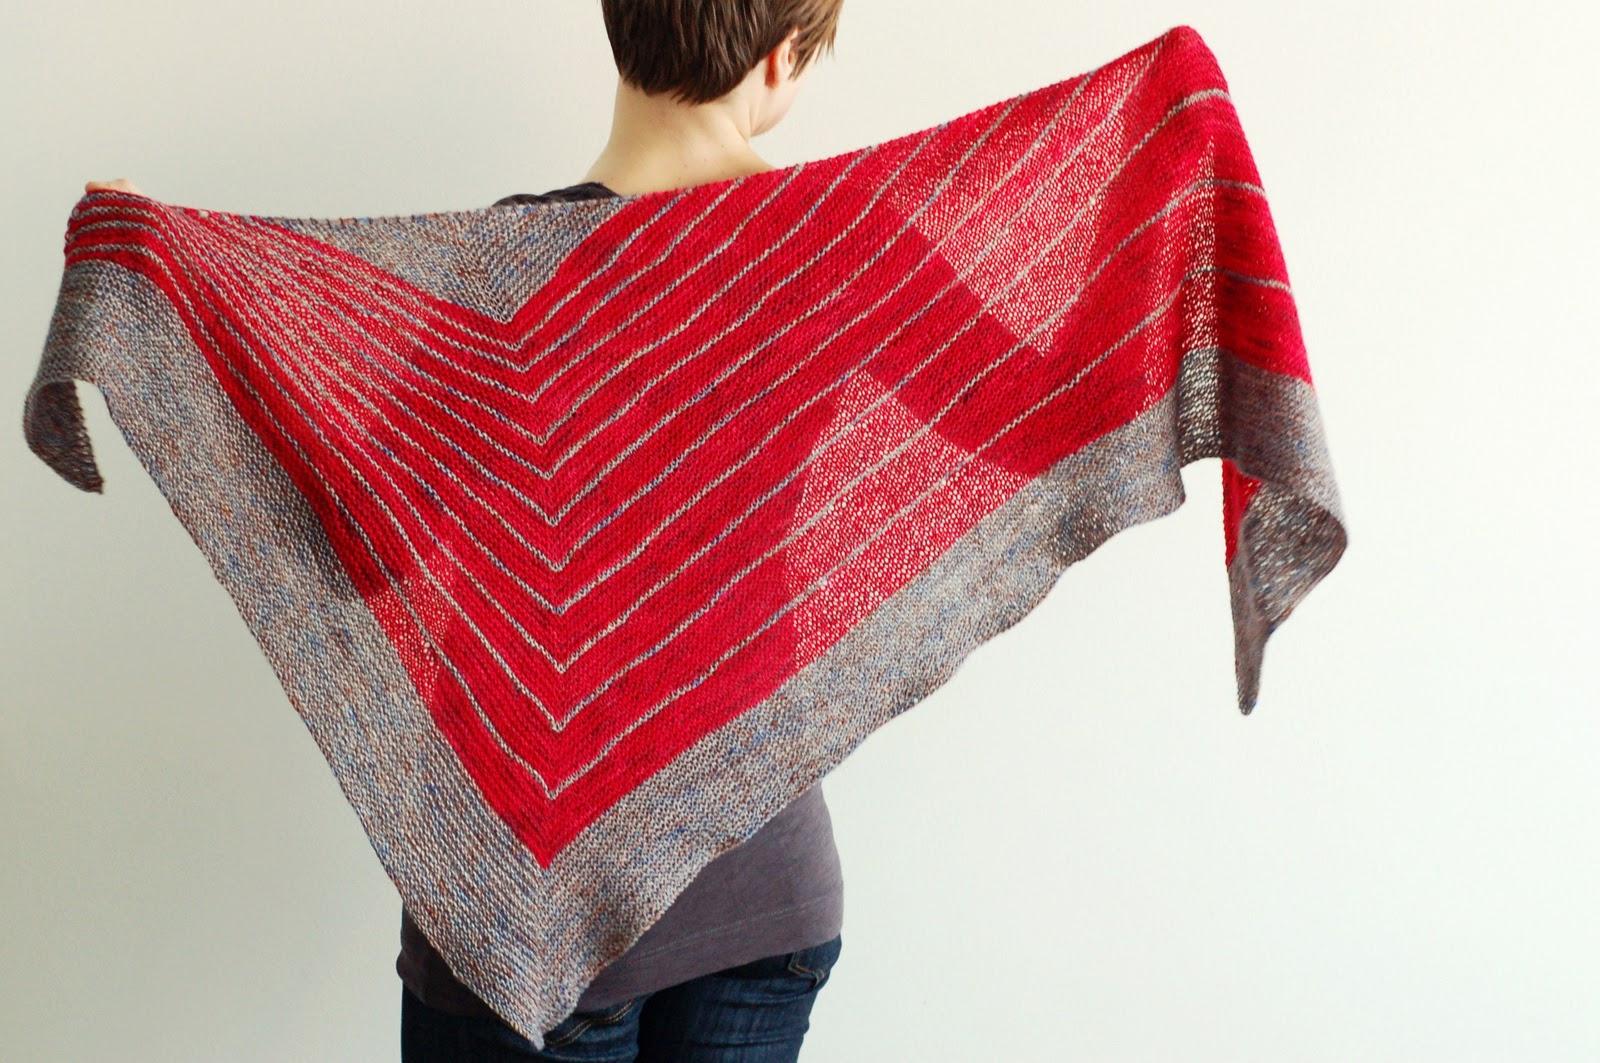 How Many Knit Stitches For A Shawl : 100% rain: stripe study shawl